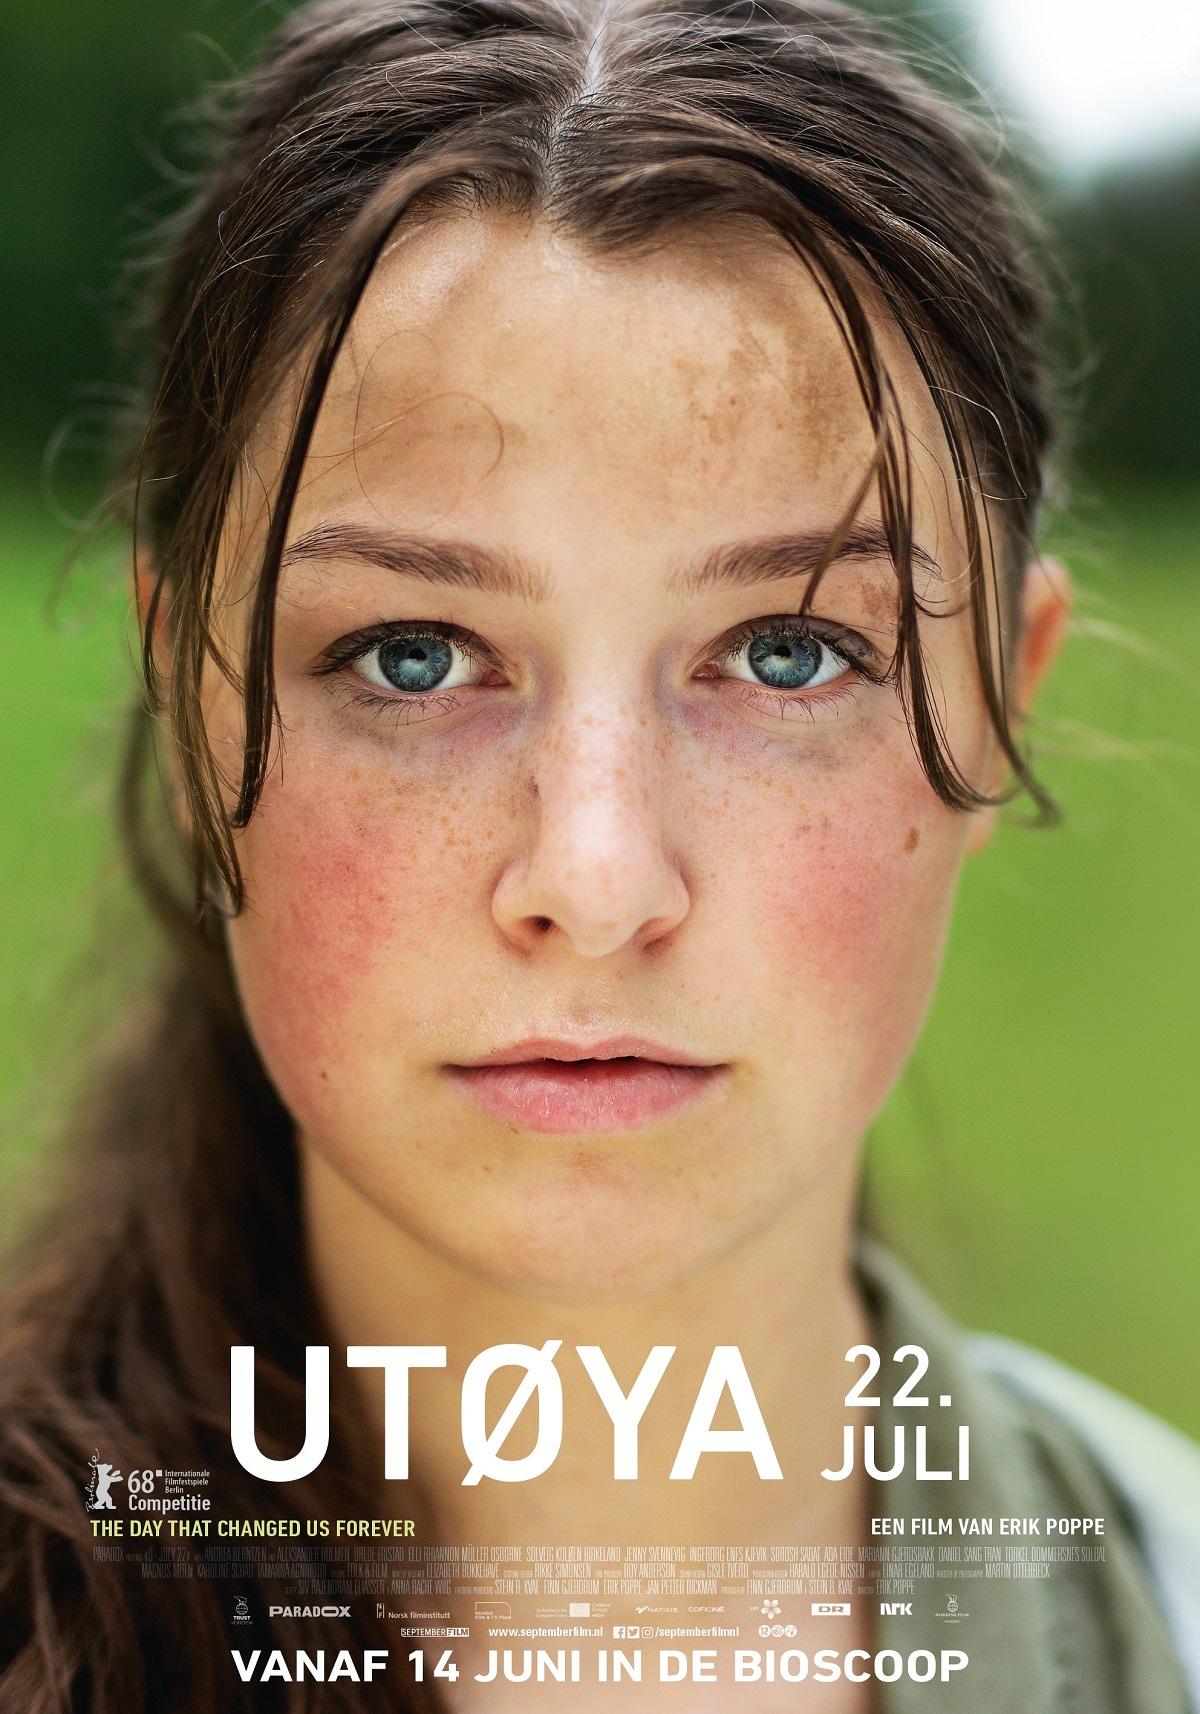 utoya 22 juli film